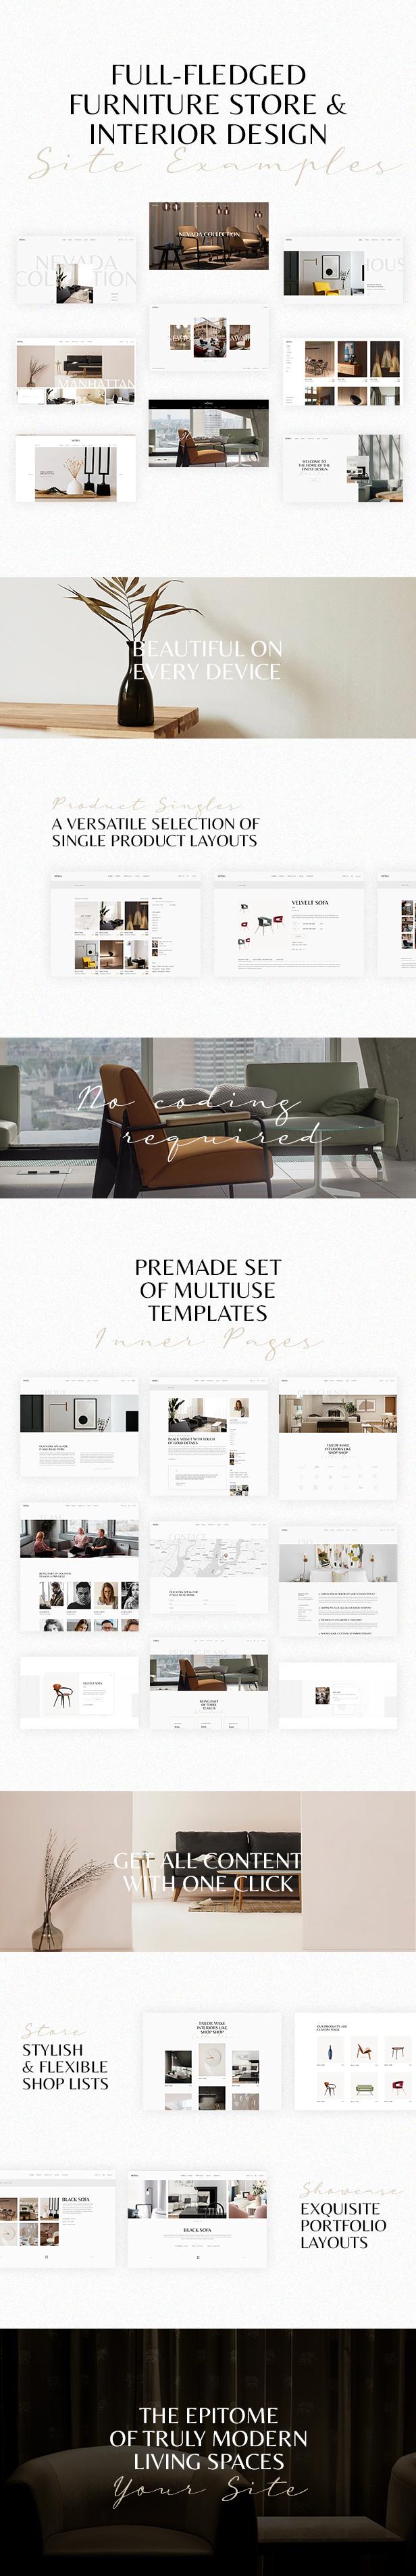 Töbel - Modern Furniture Store - 3